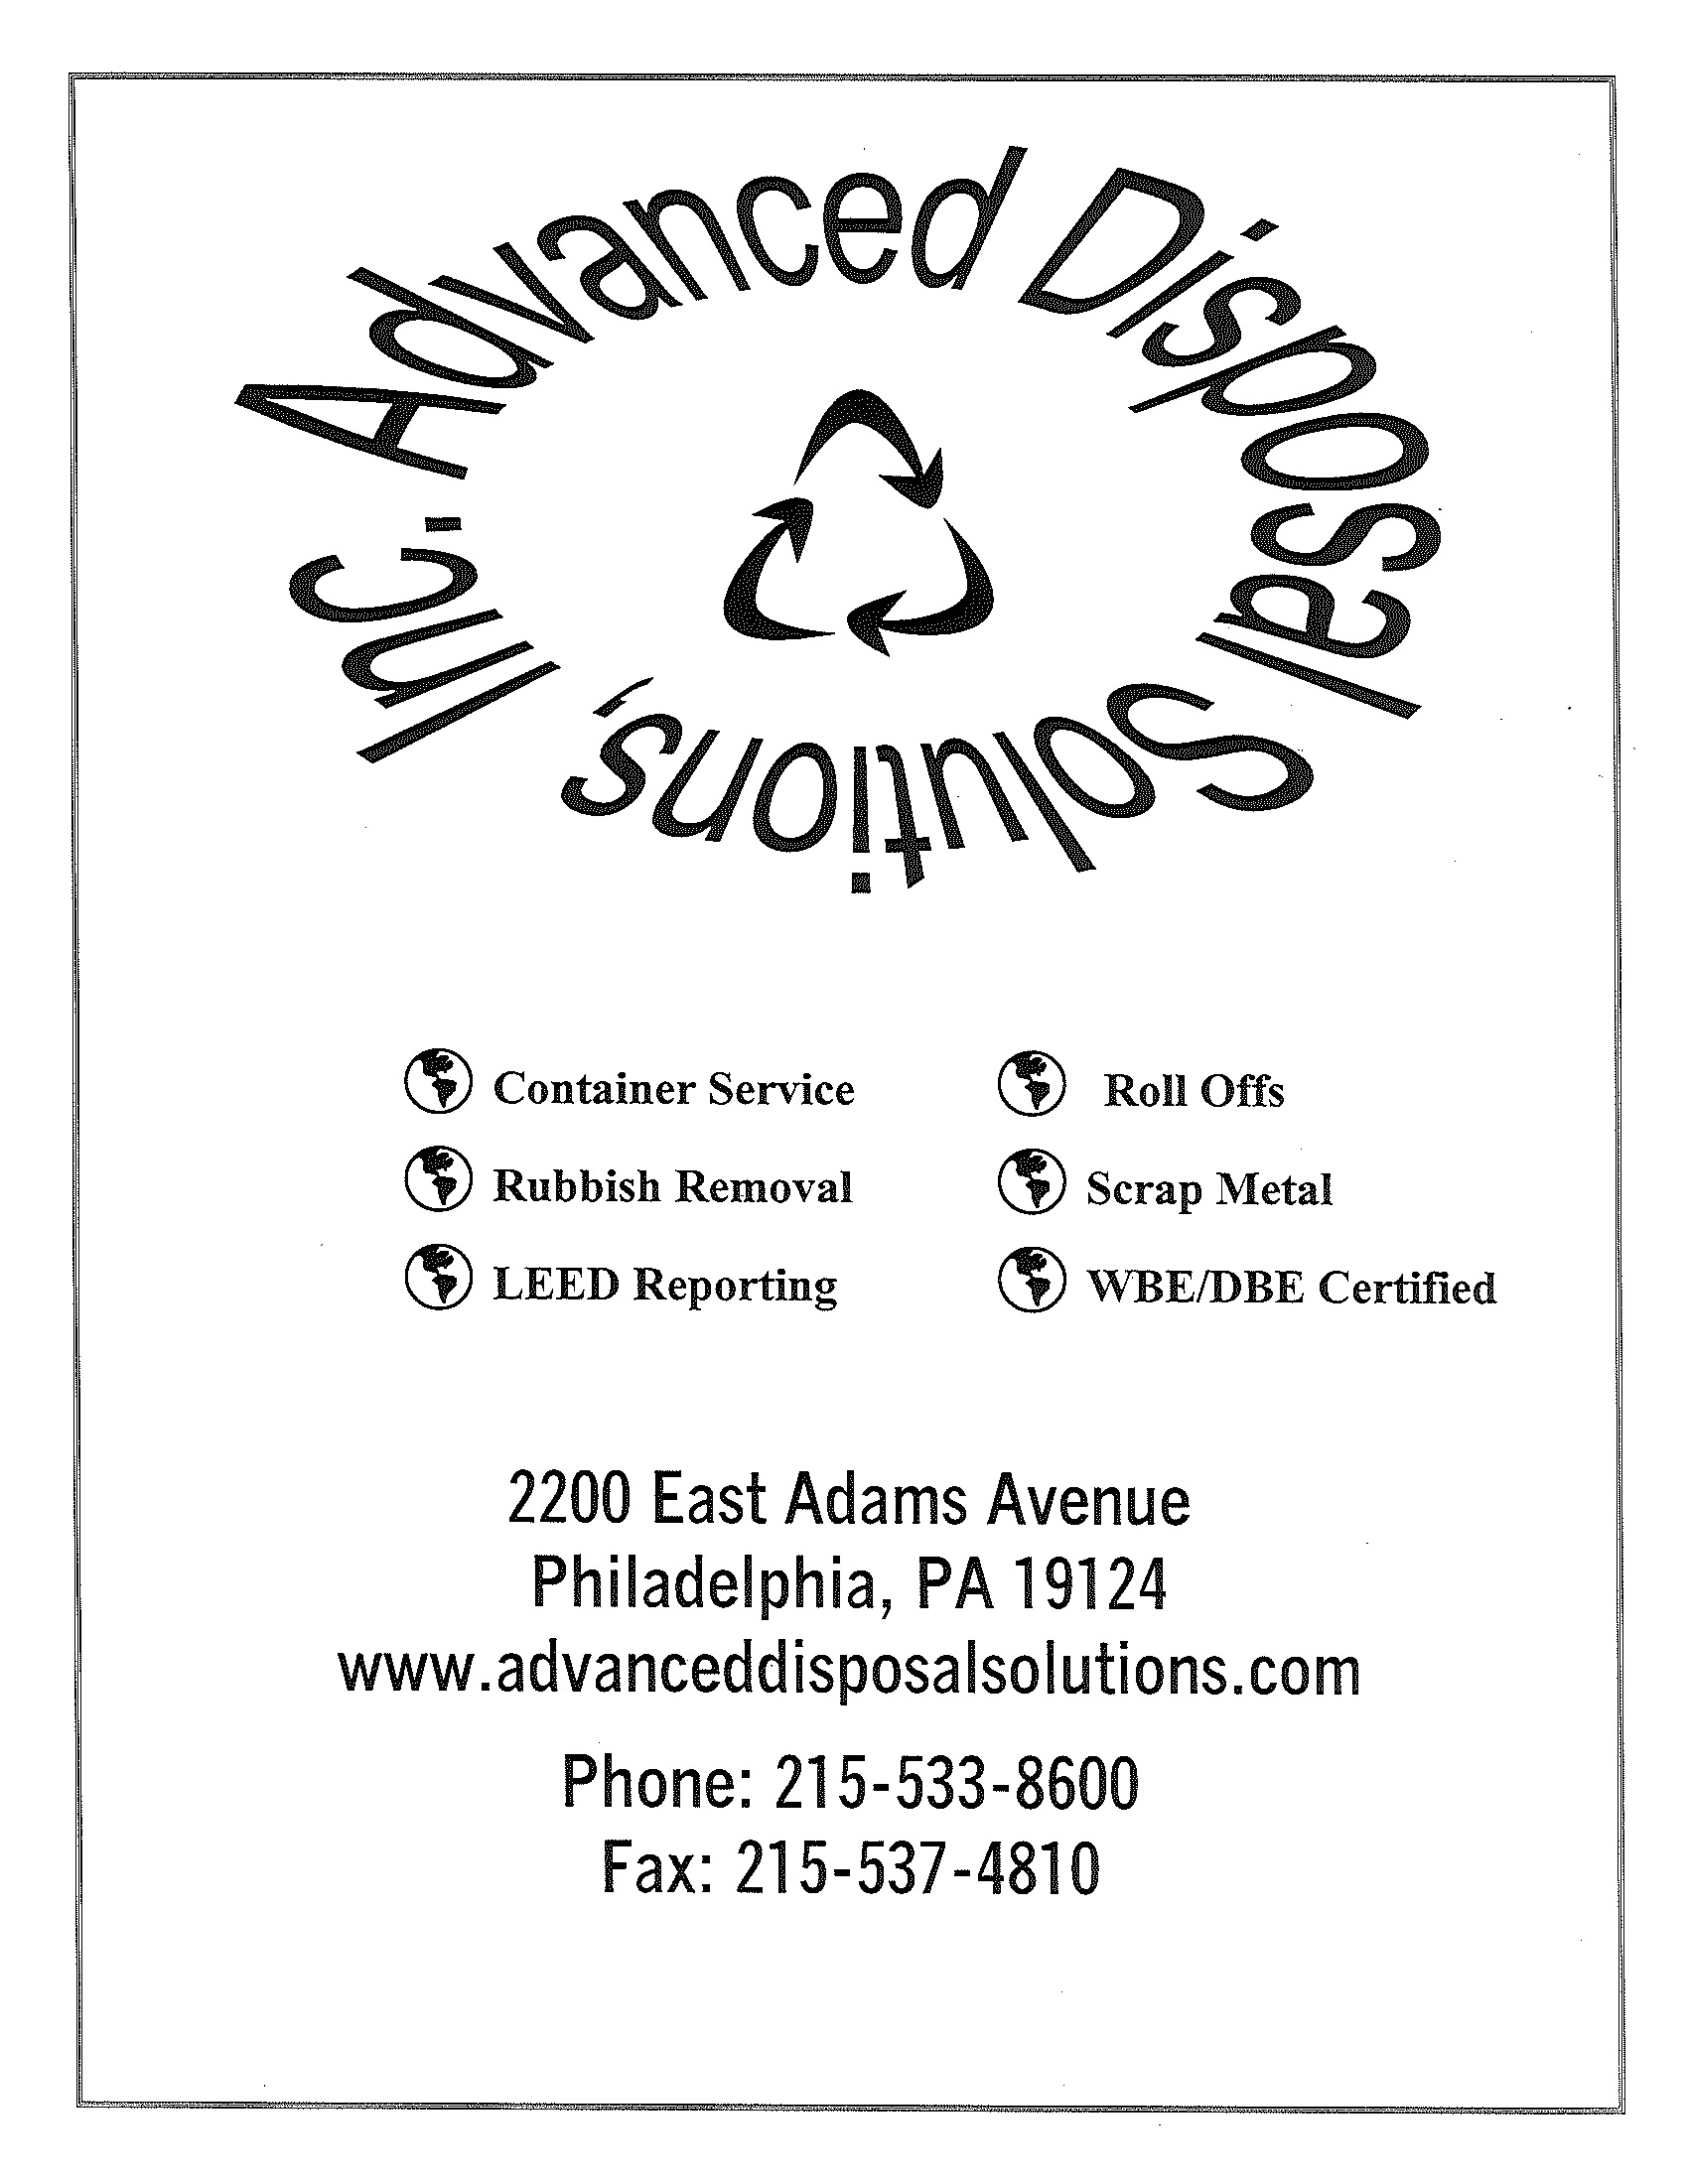 Advanced Disposal Solutions